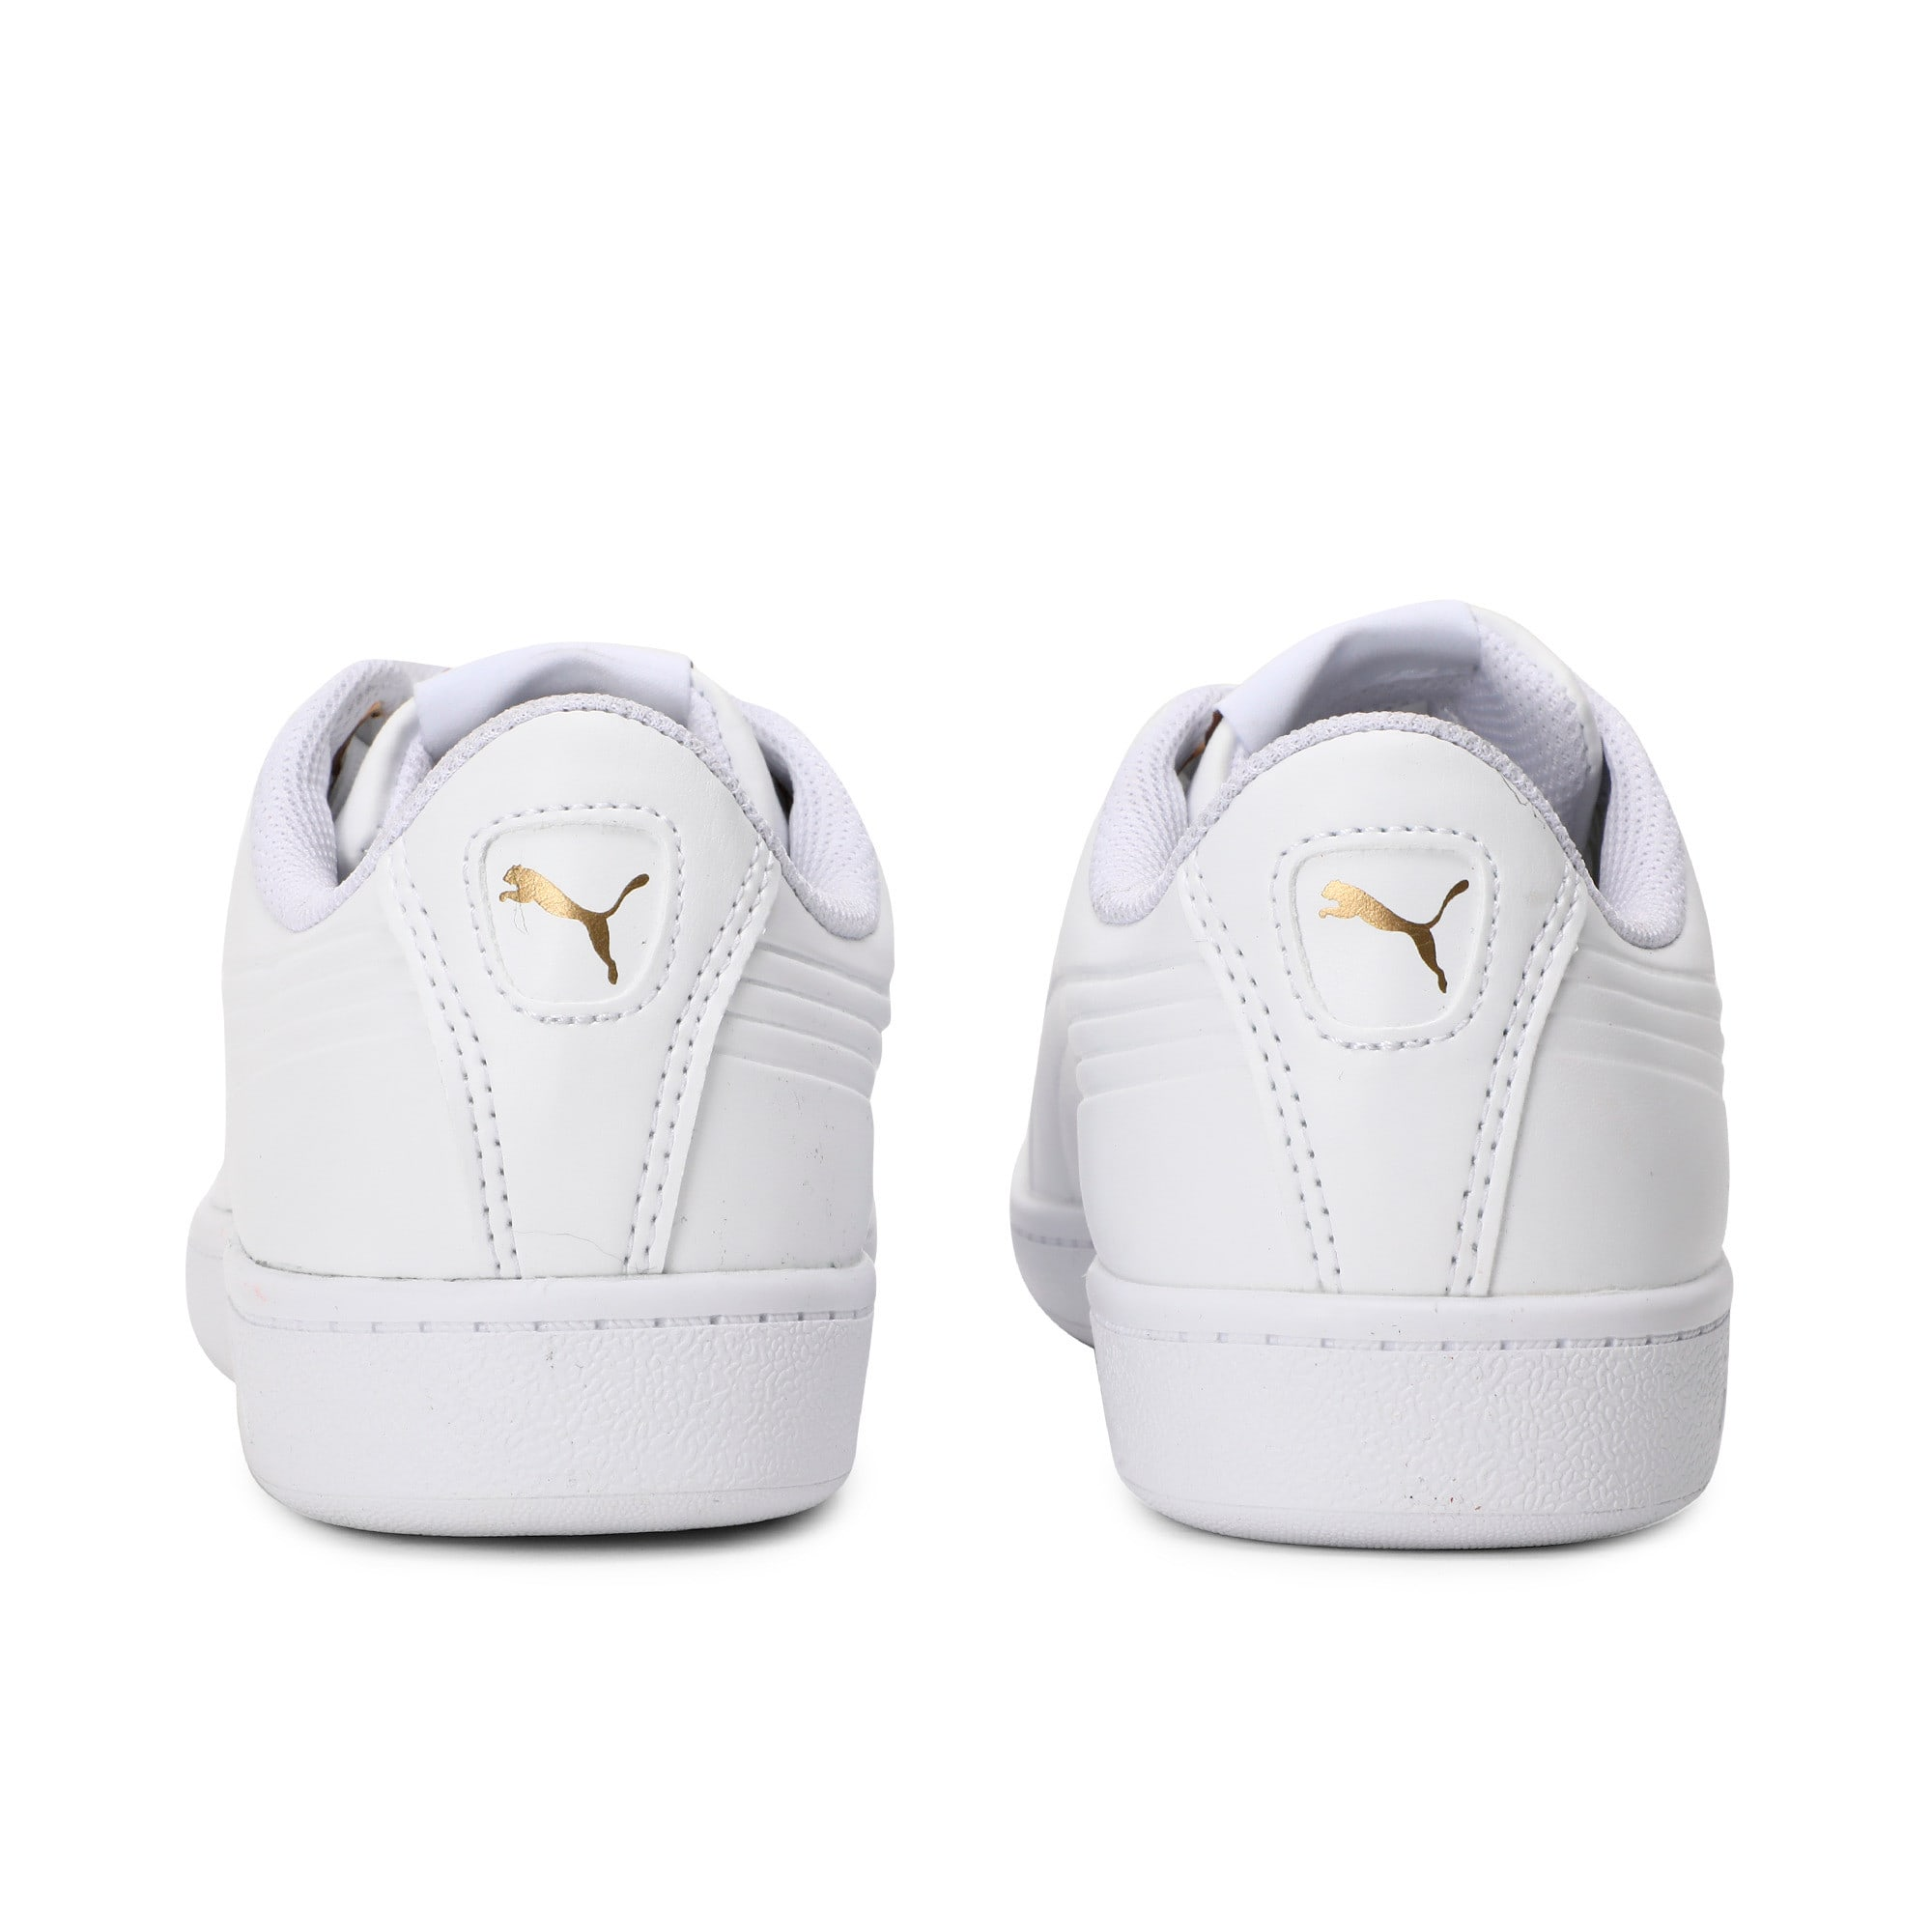 Thumbnail 2 of Women's Puma Vikky Ribbon Sneakers, Puma White-Puma White, medium-IND